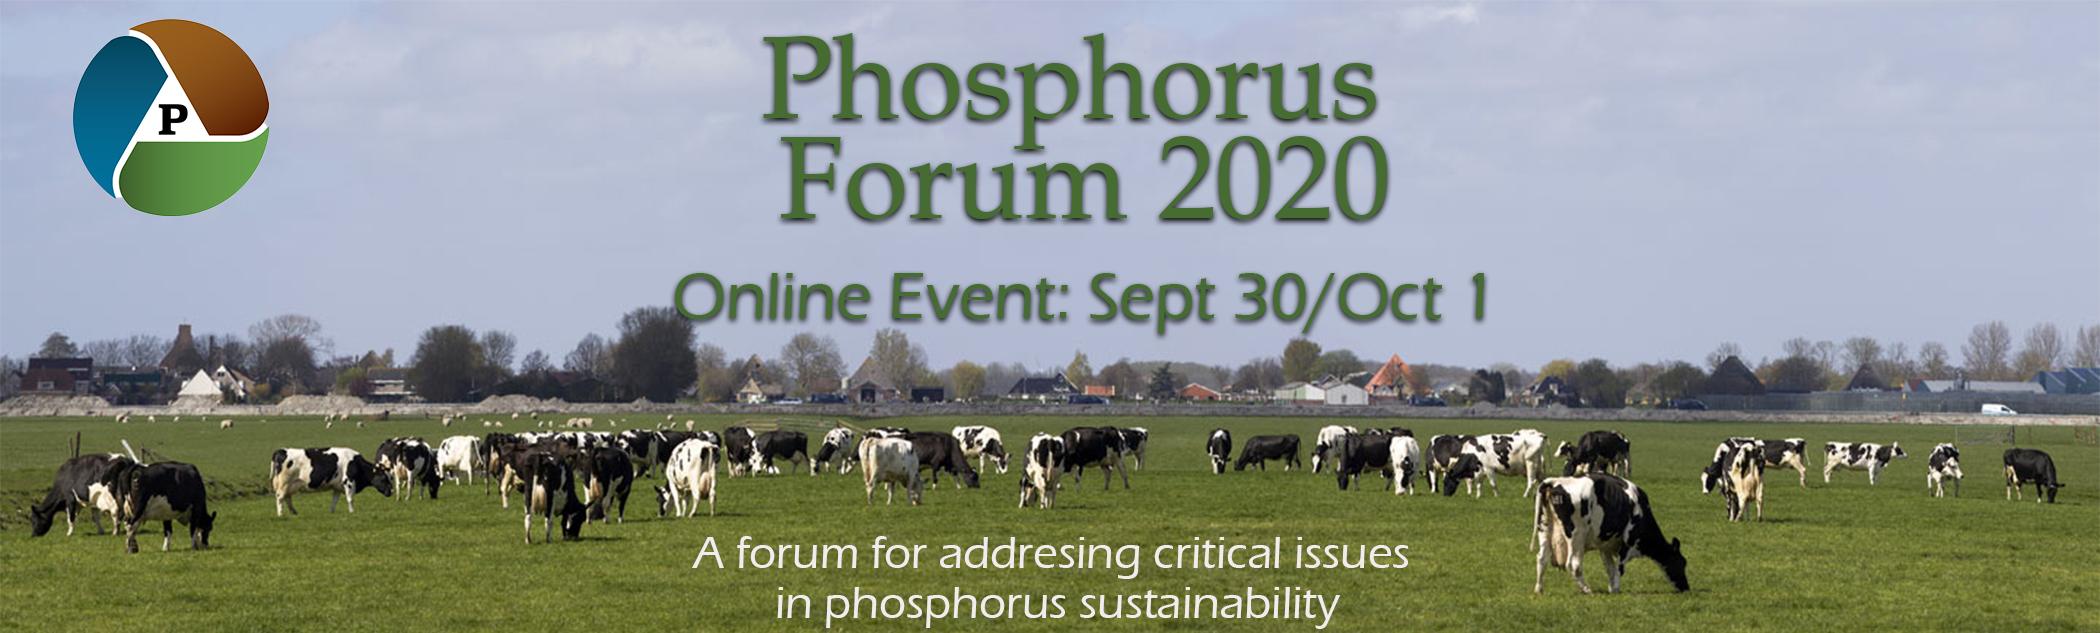 Phosphorus Forum 2020 image banner link